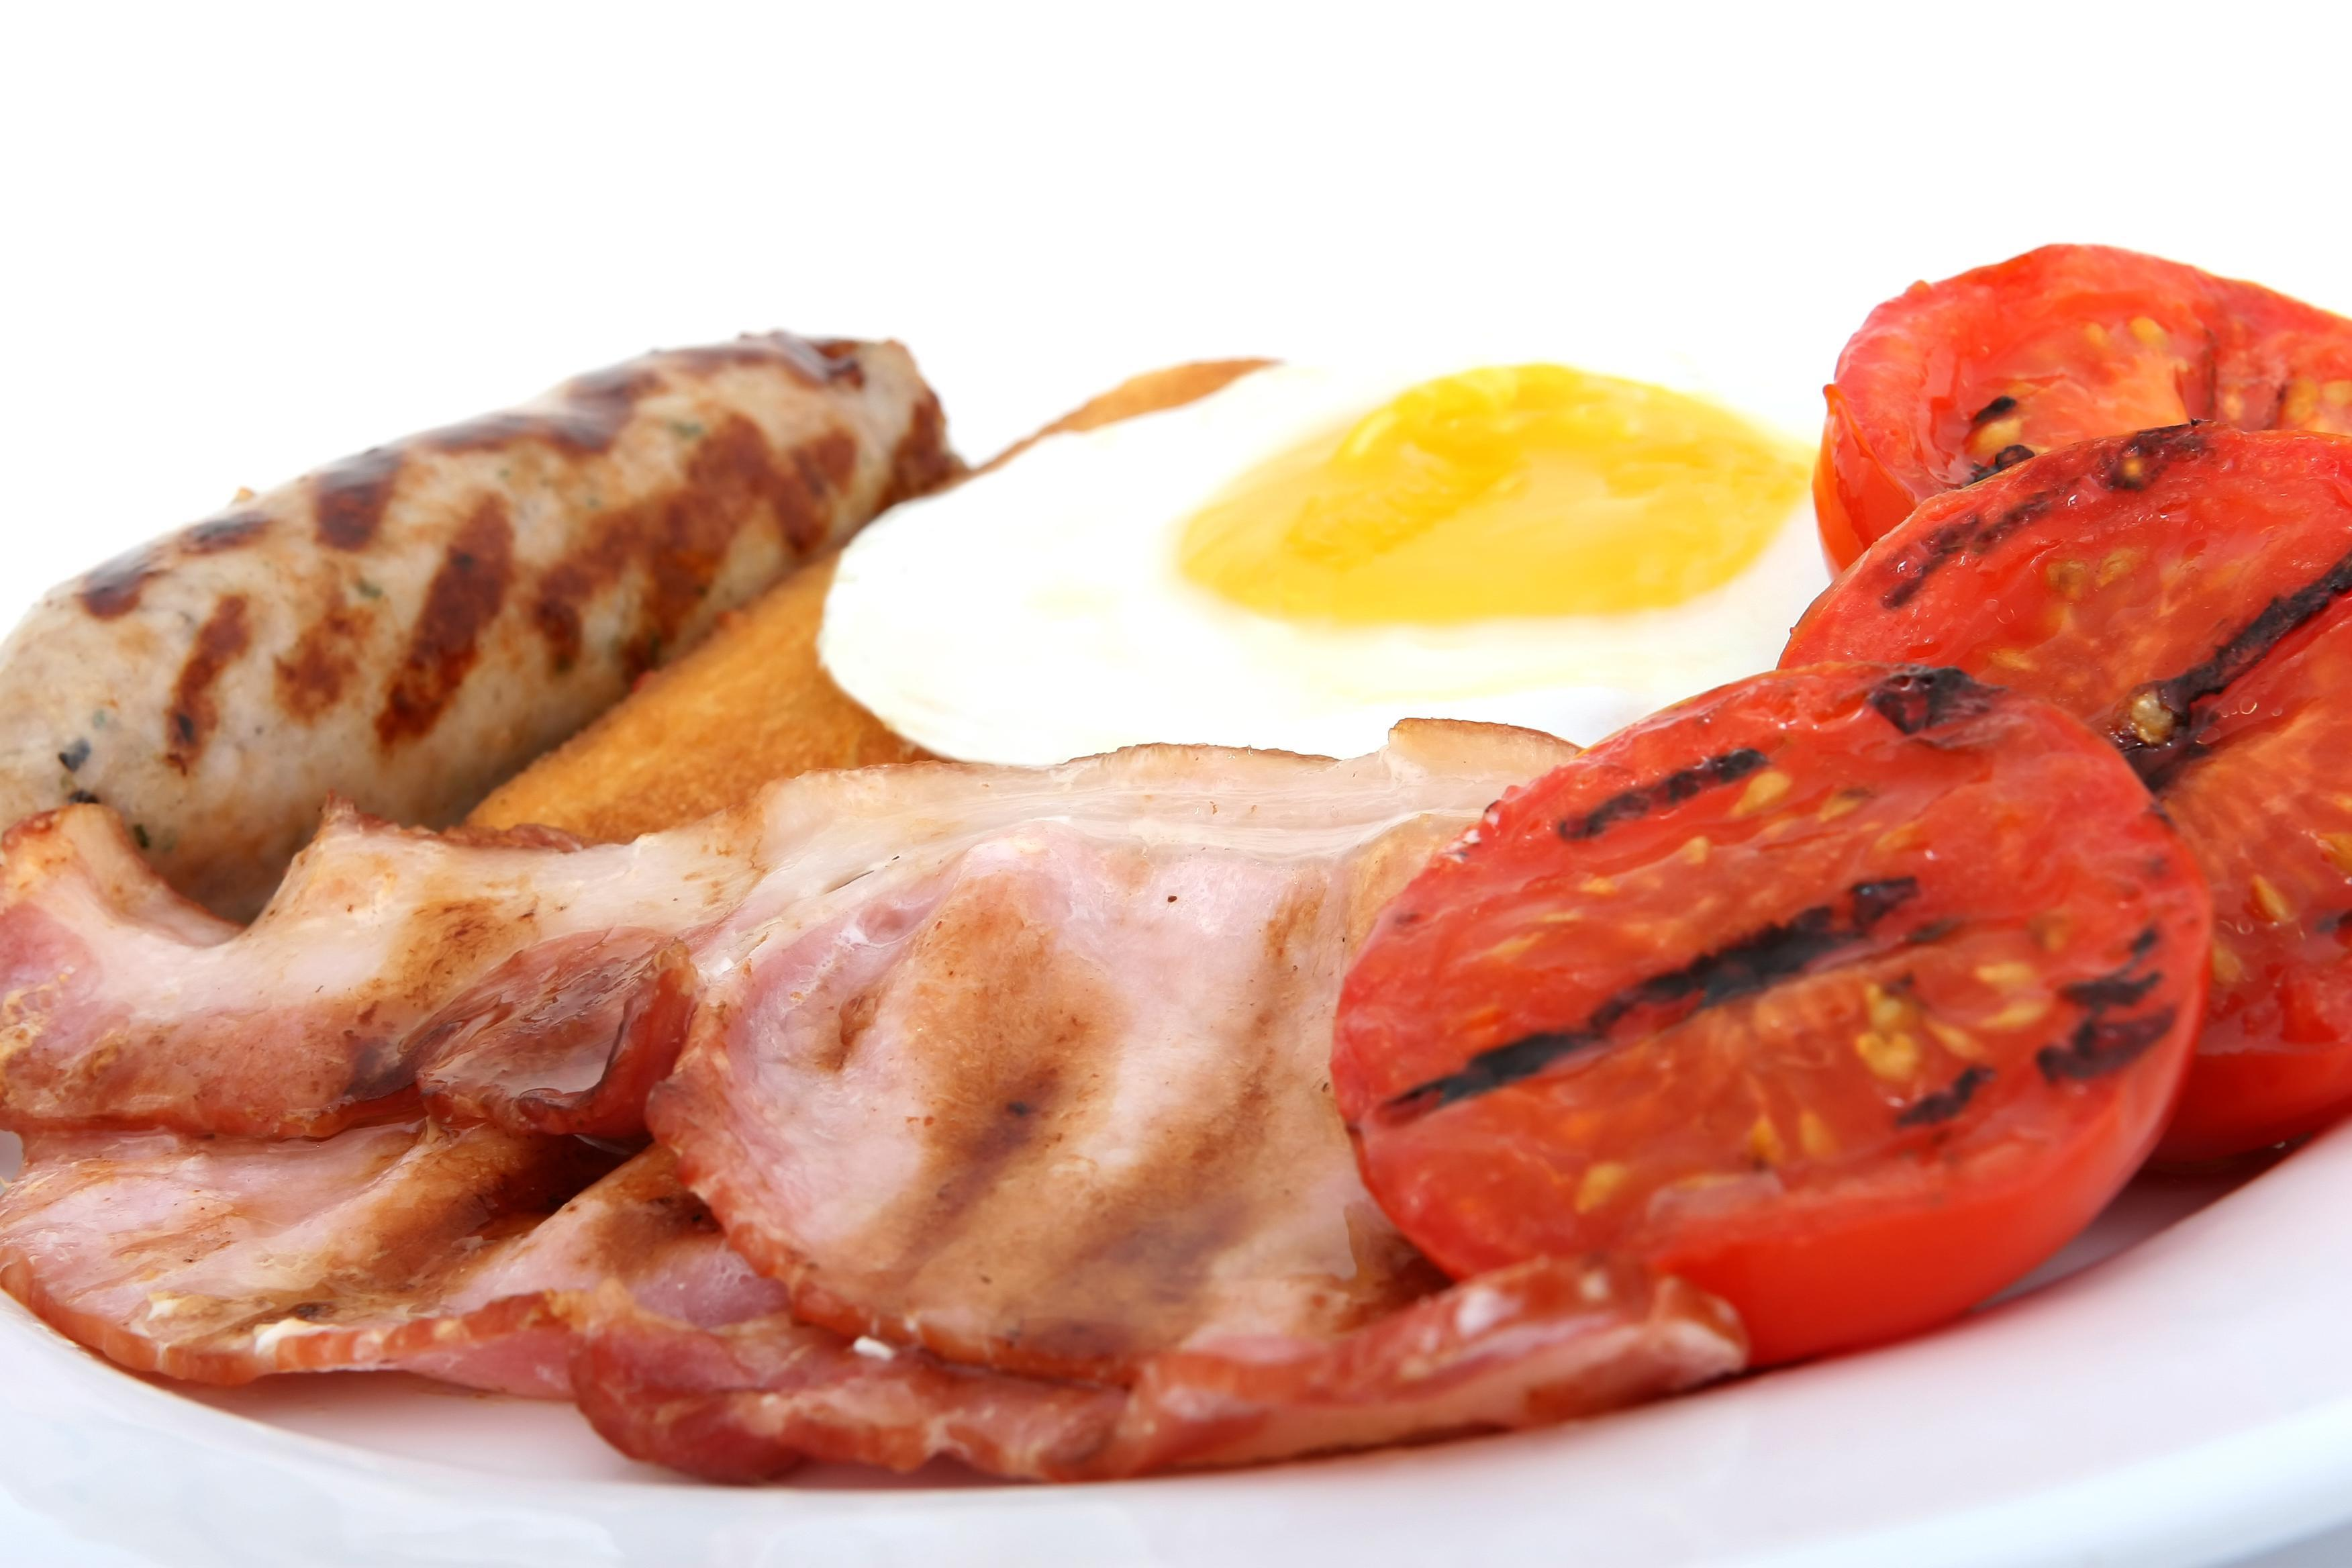 Declarando Guerra ao Colesterol